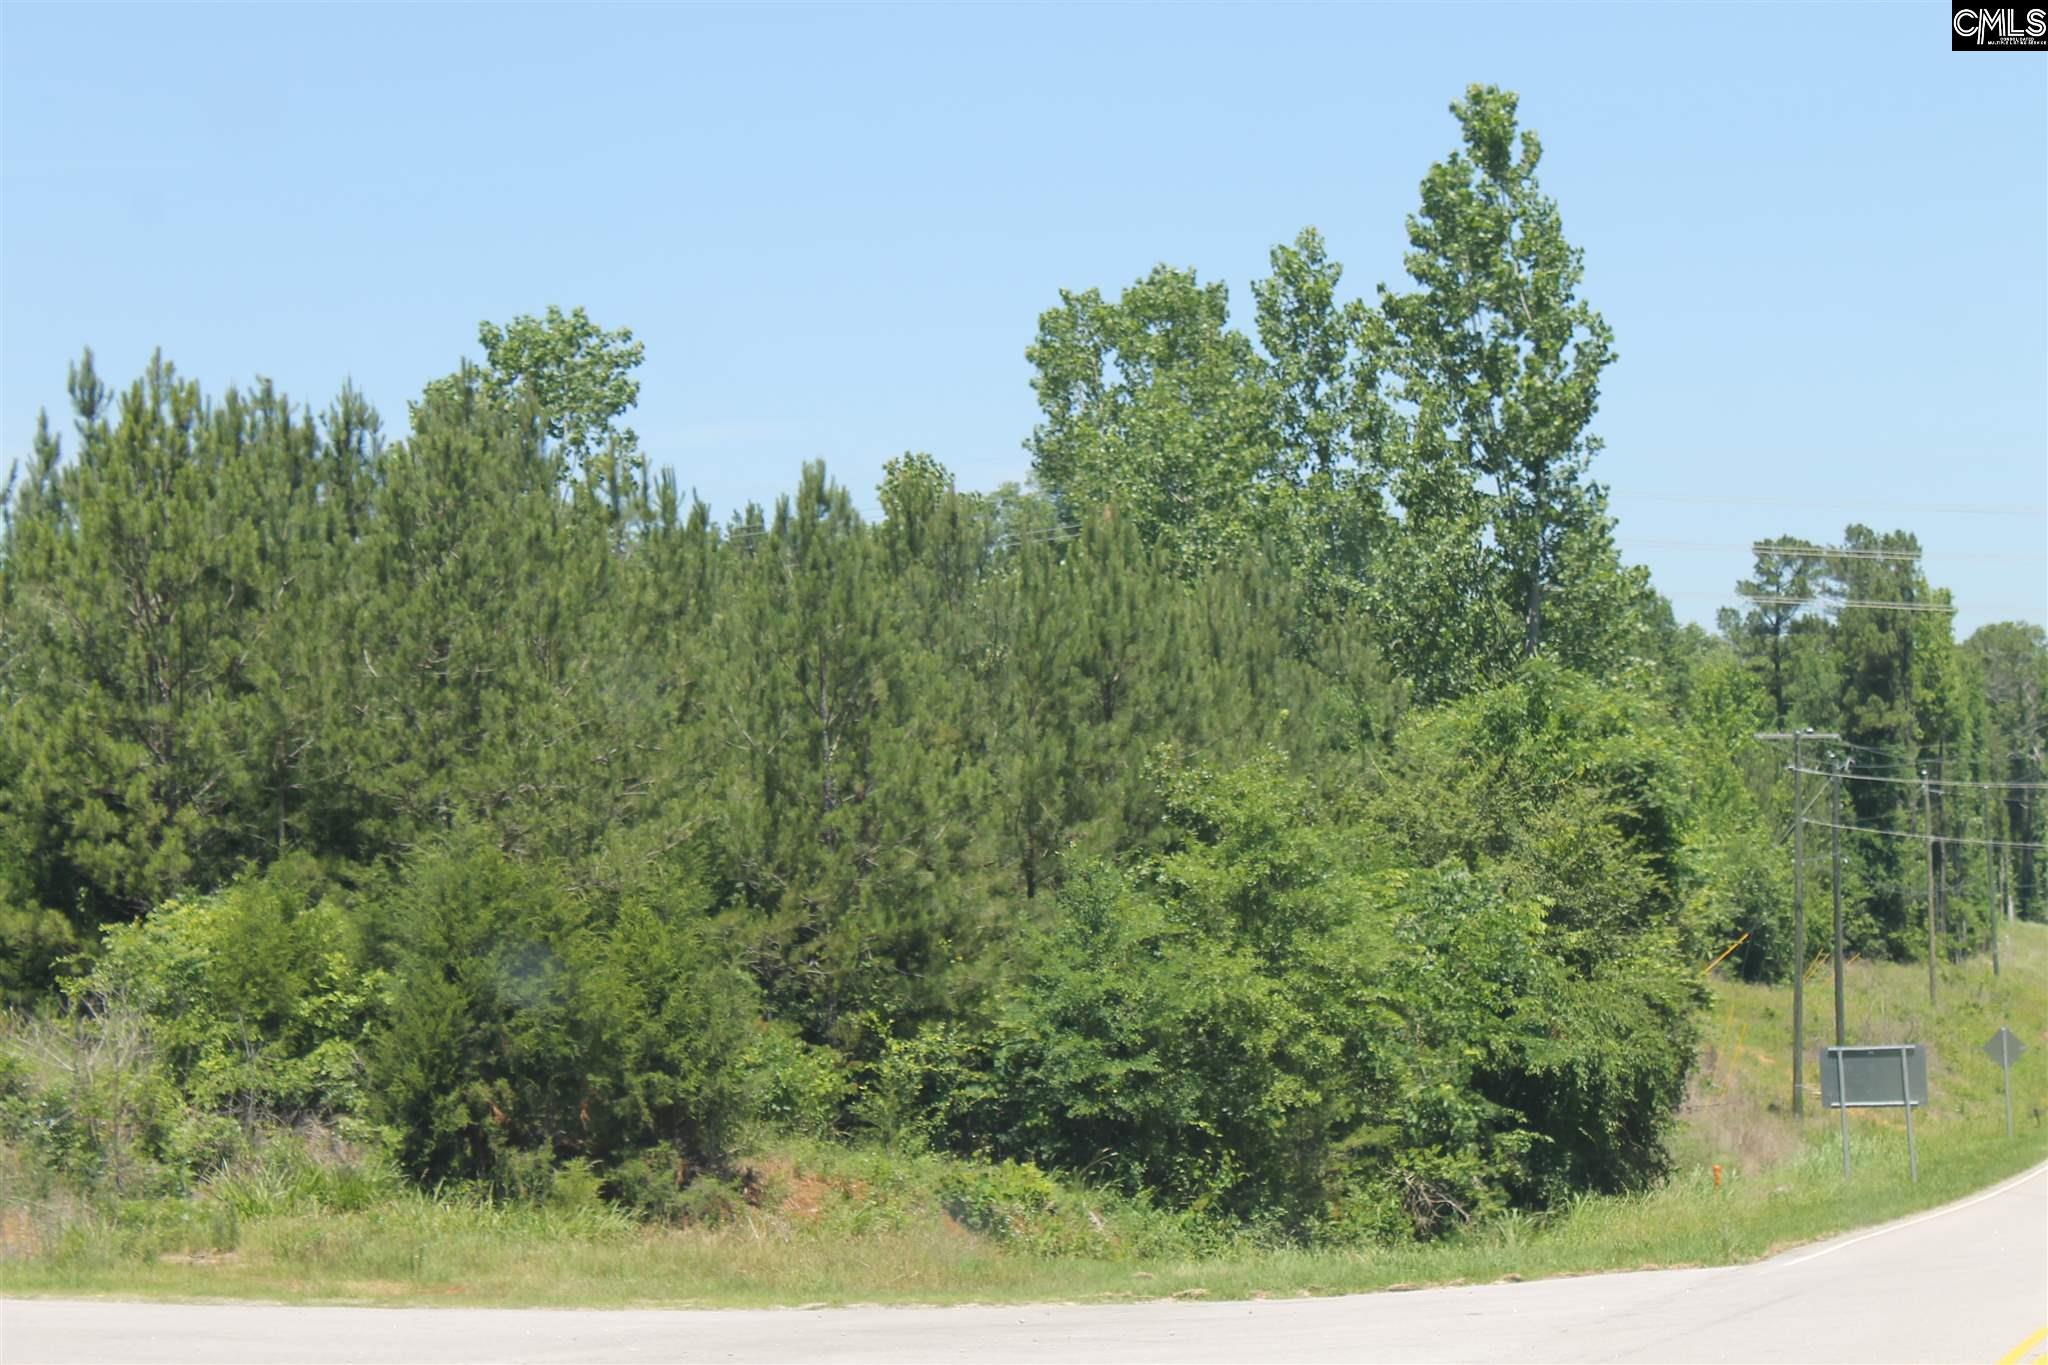 Highway 202 & I-26 Little Mountain, SC 29075